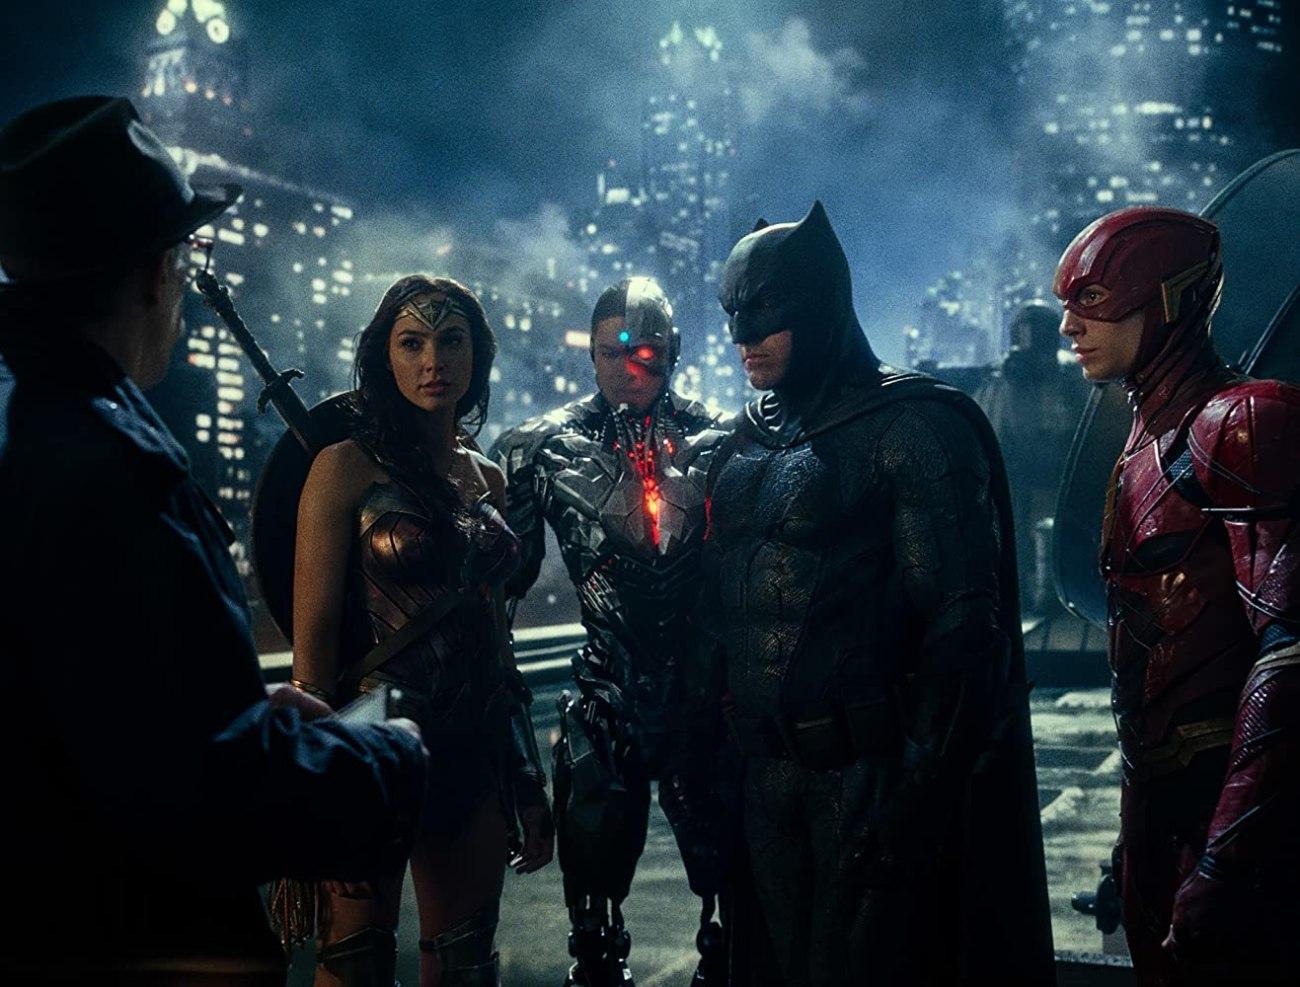 El Comisionado James Gordon (J.K. Simmons), Wonder Woman (Gal Gadot), Cyborg (Ray Fisher), Batman (Ben Affleck) y Flash (Ezra Miller) en Justice League (2017). Imagen: Warner Bros. Pictures/Ratpac-Dune Entertainment